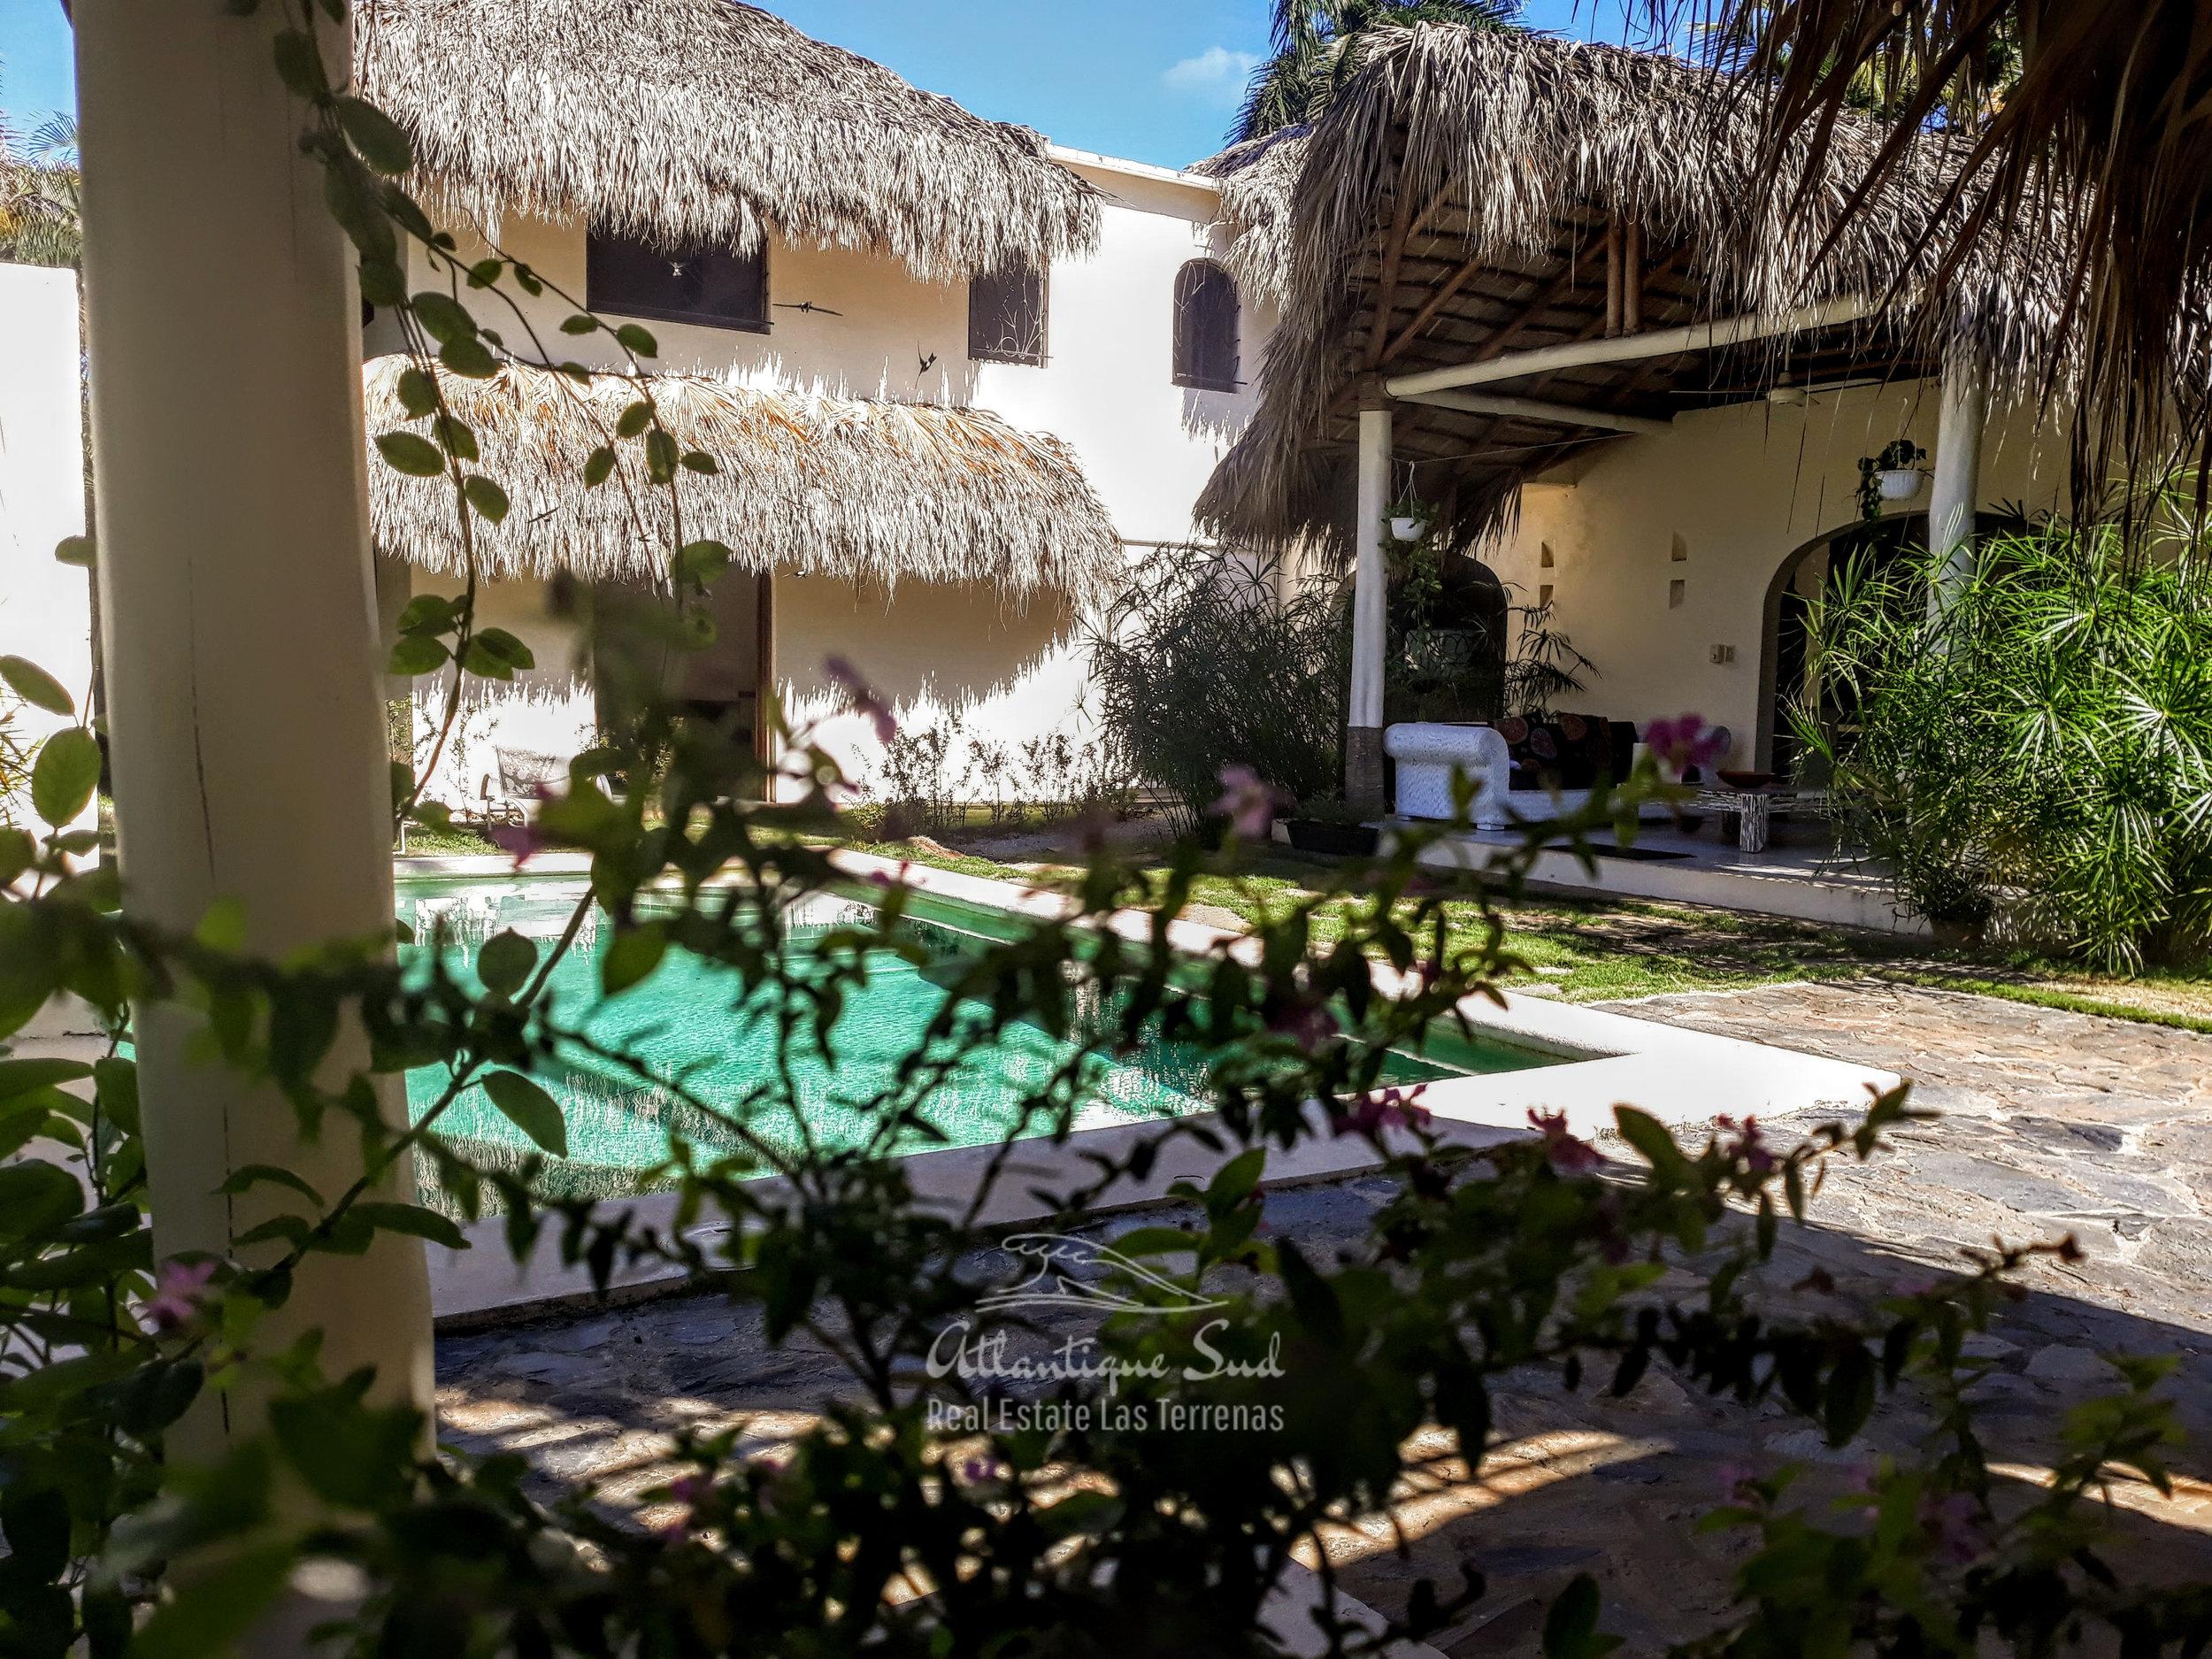 Authentic Caribbean Villa in quiet community in Real Estate Las Terrenas Atlantique Sud29.jpg